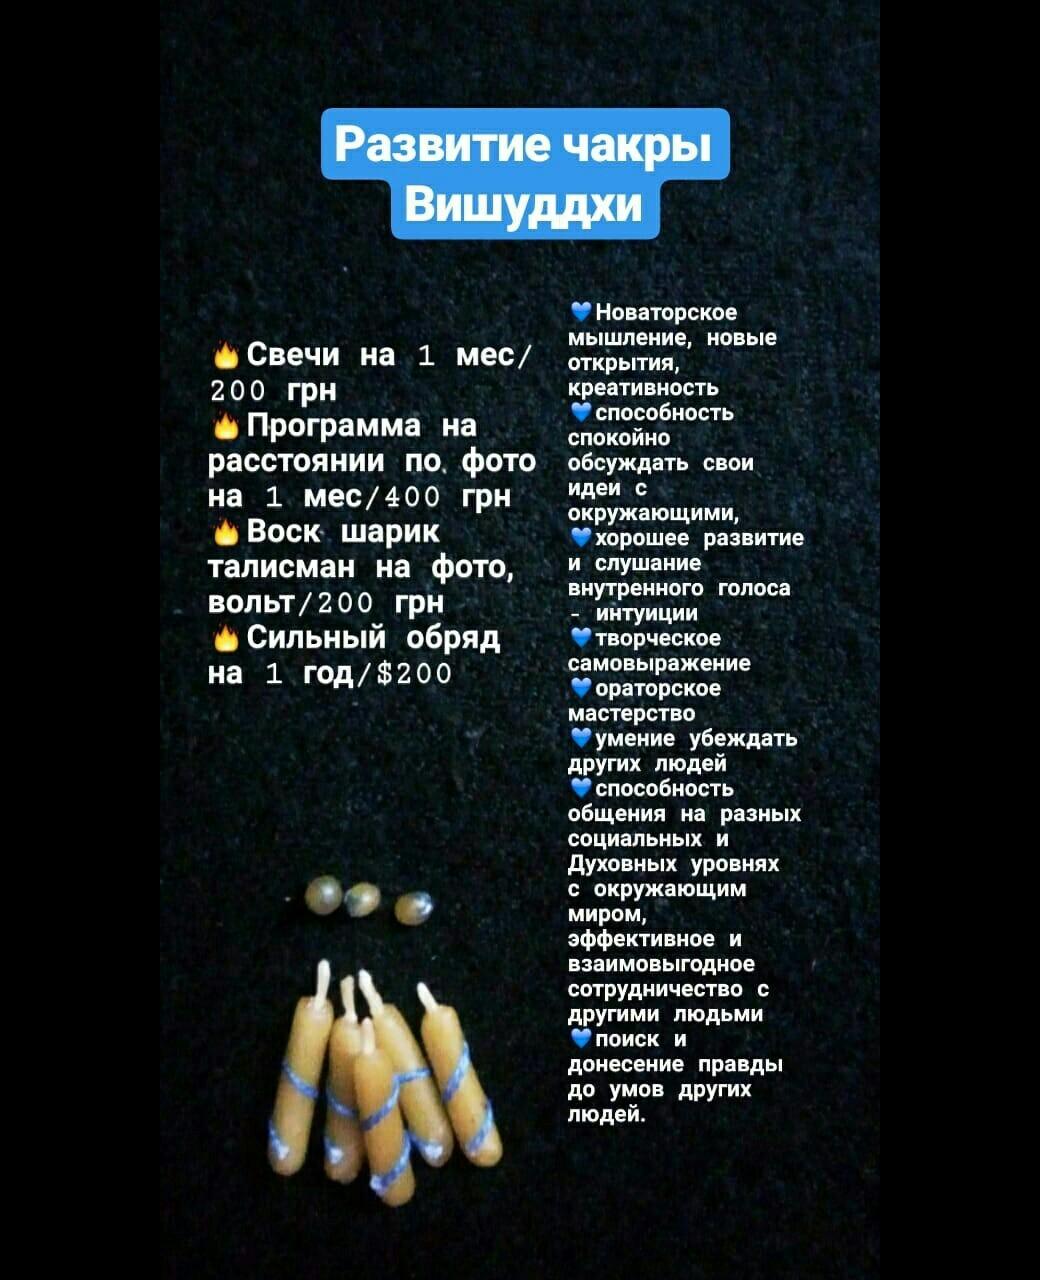 Хештег муладхара на   Салон Магии и мистики Елены Руденко ( Валтеи ). Киев ,тел: 0506251562  SDVb3lgh5rU